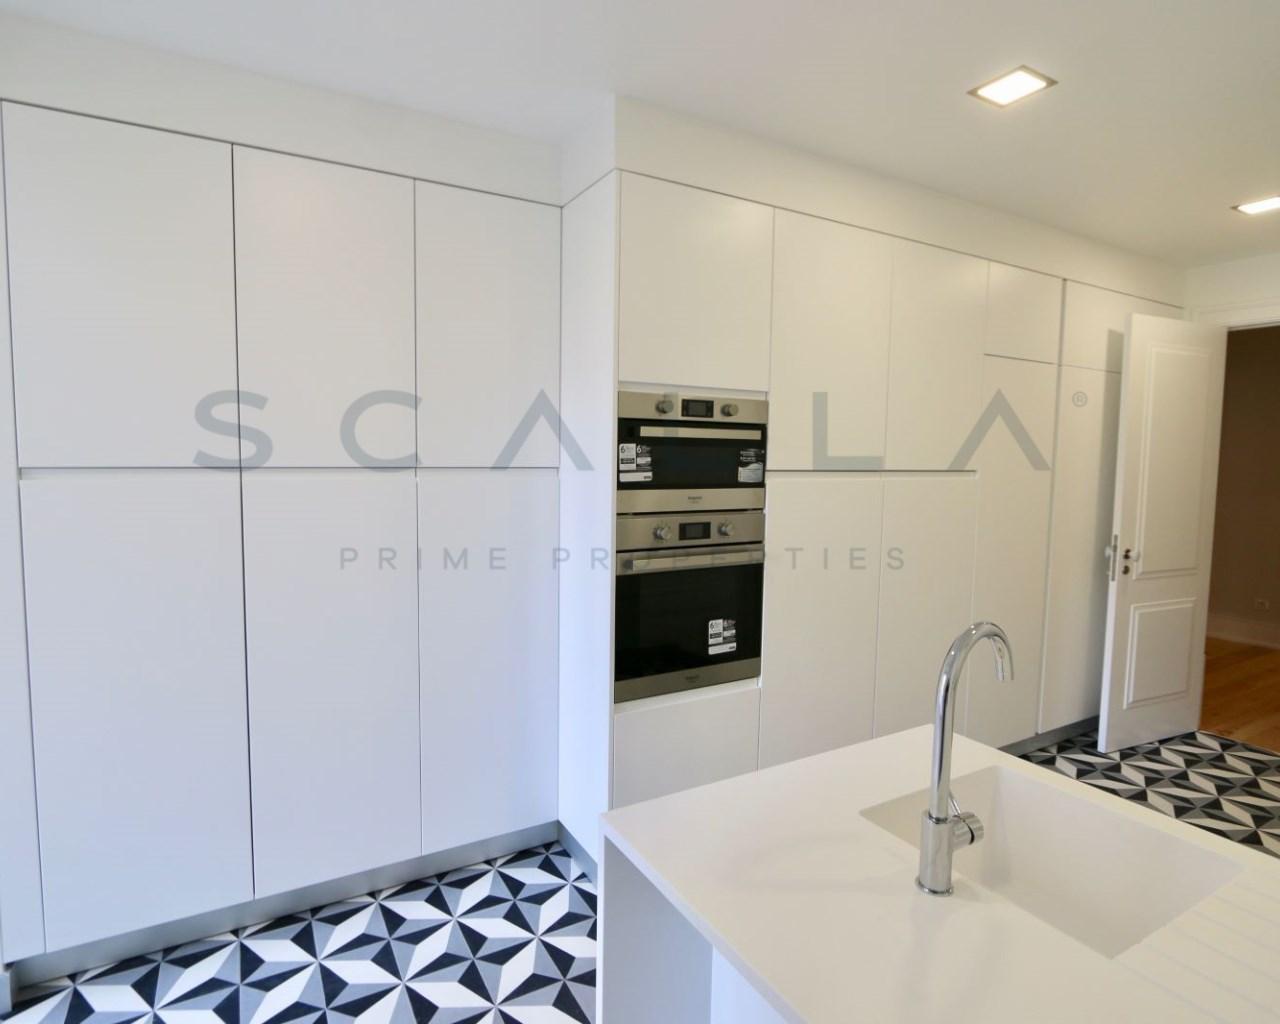 patio kitchen stainless steel shelves for 优秀的公寓与4间客房与露台在坎普pequeno scalla prime properties 厨房